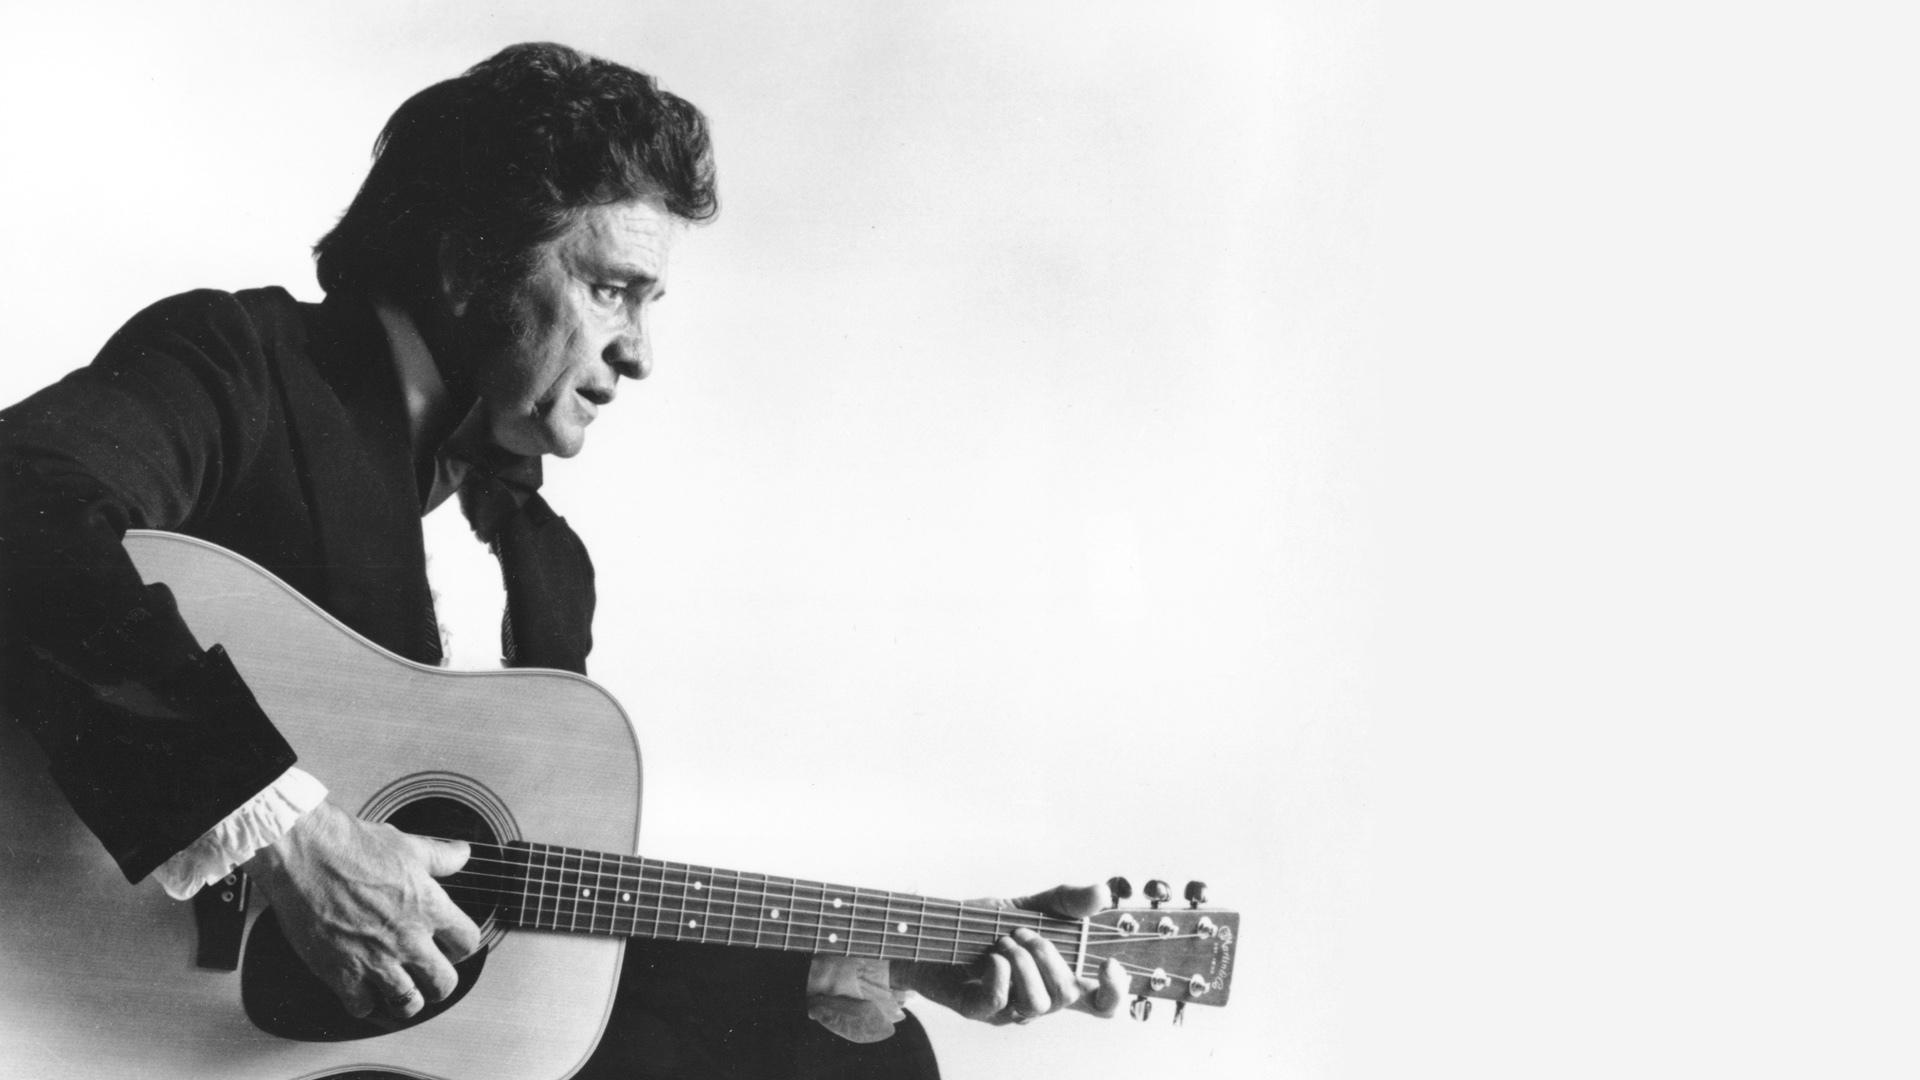 Johnny Cash Images